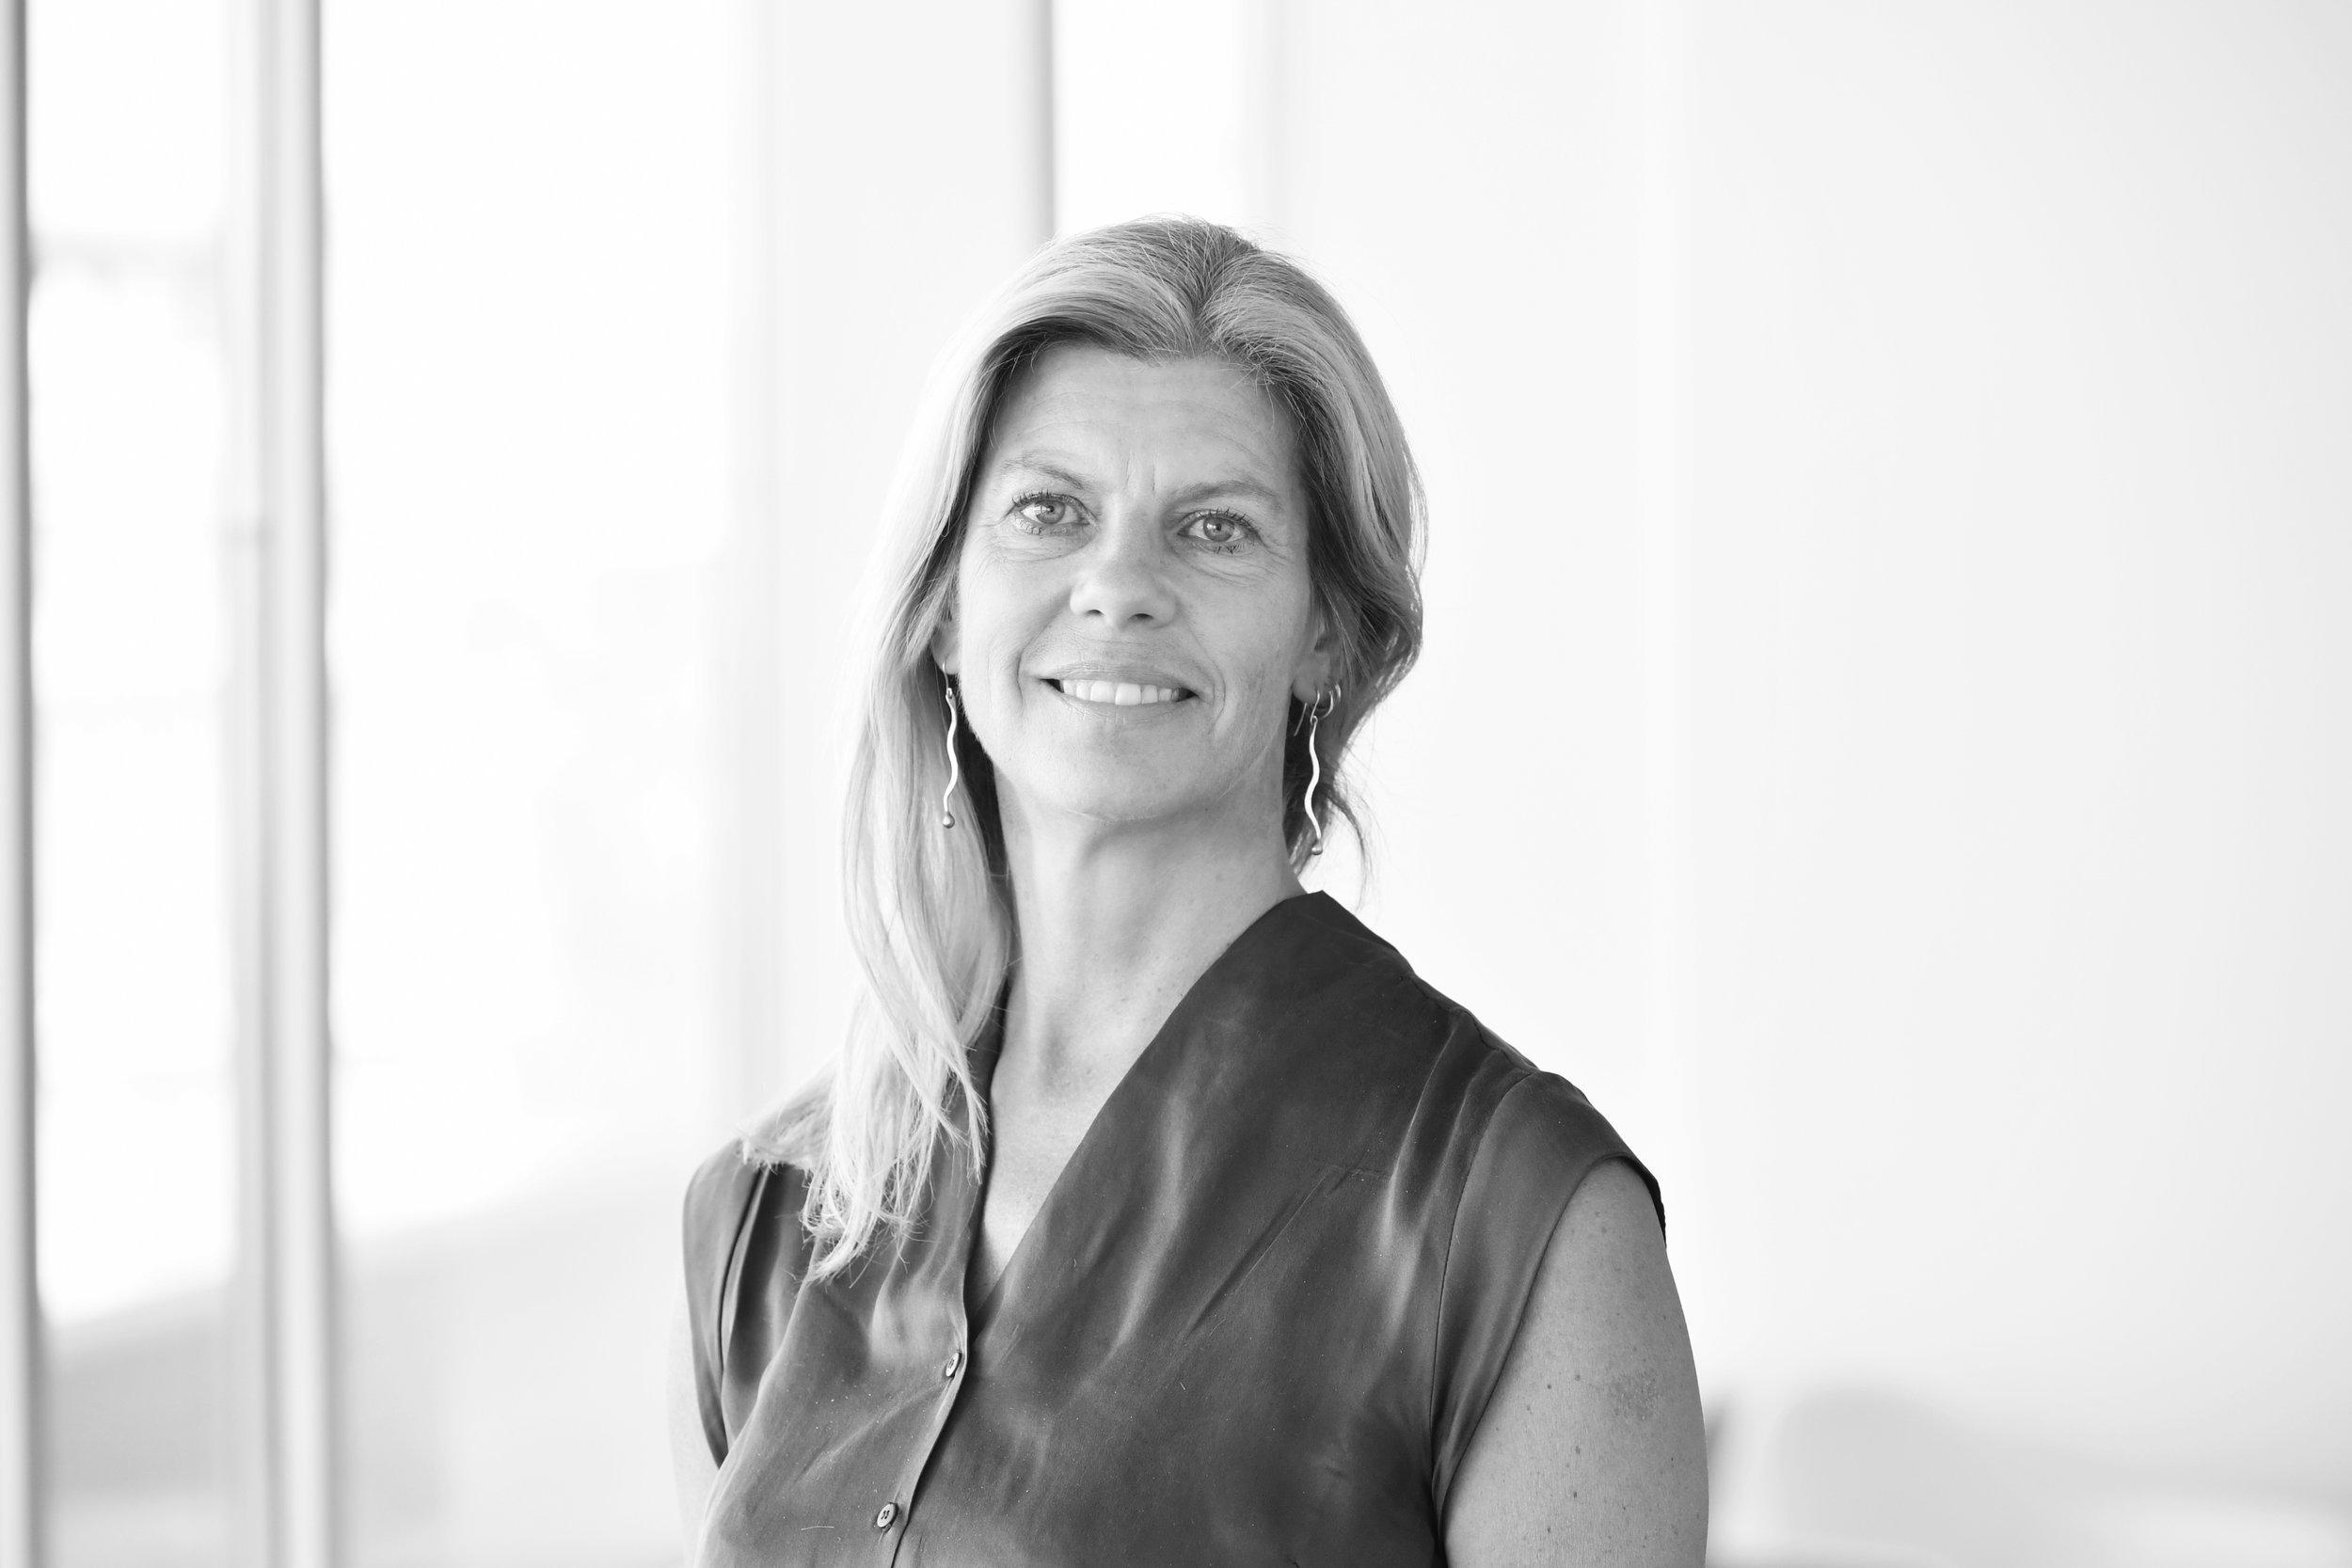 Ing-Marie Bigert Möller - KontorschefLång erfarenhet inom professional services. Tidigare McKinsey & Company, Nordea, Invacare, EIM, mm. Läs mer →+46 (0)8 503 855 02ibm@nordicinterim.com